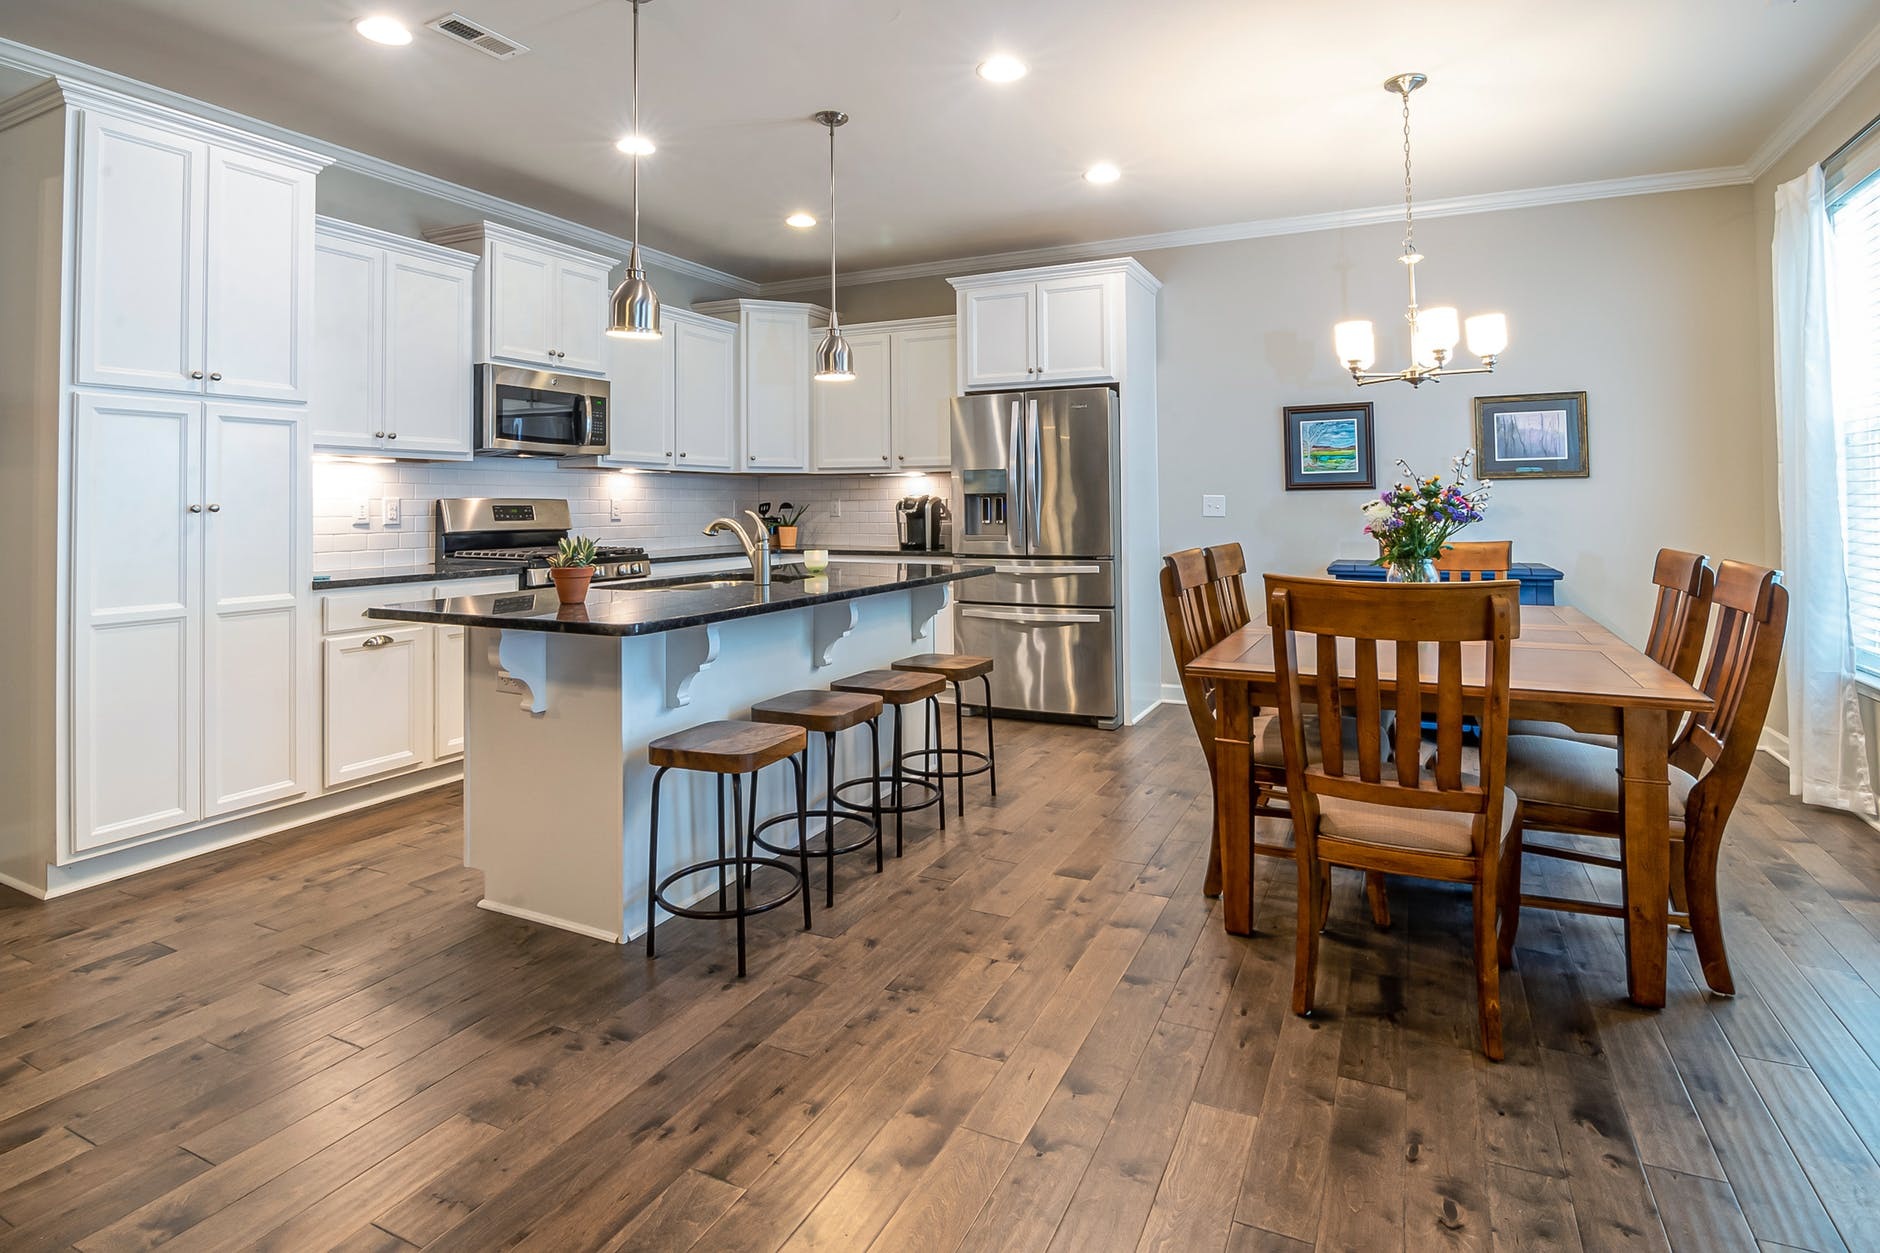 durable kitchen flooring